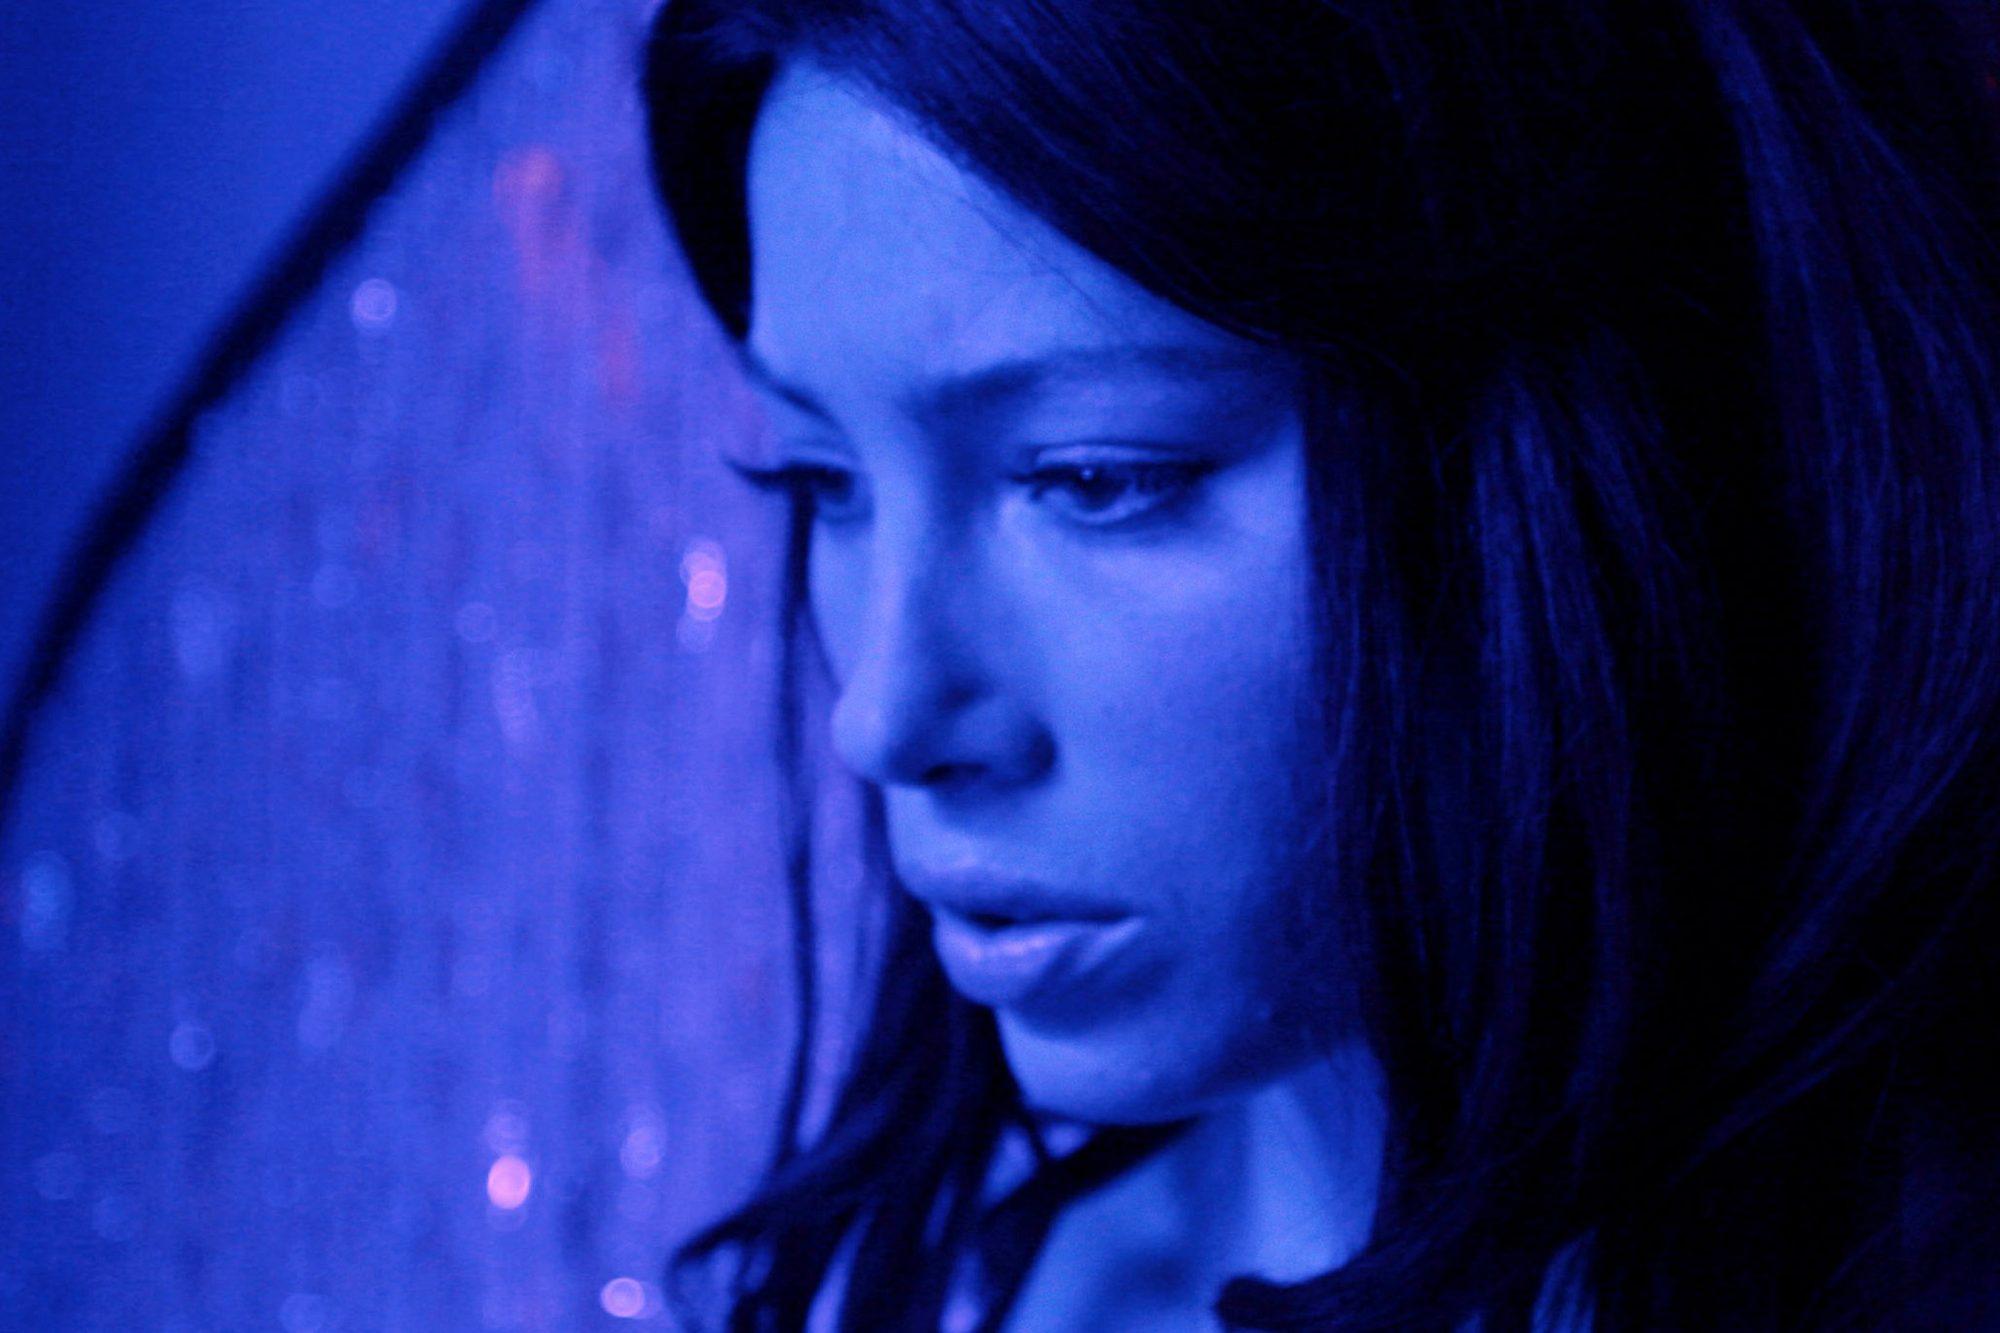 POWDER BLUE, Jessica Biel, 2009. Ph: Chuck Zlotnick/©Speakeasy Releasing/Courtesy Everett Collection